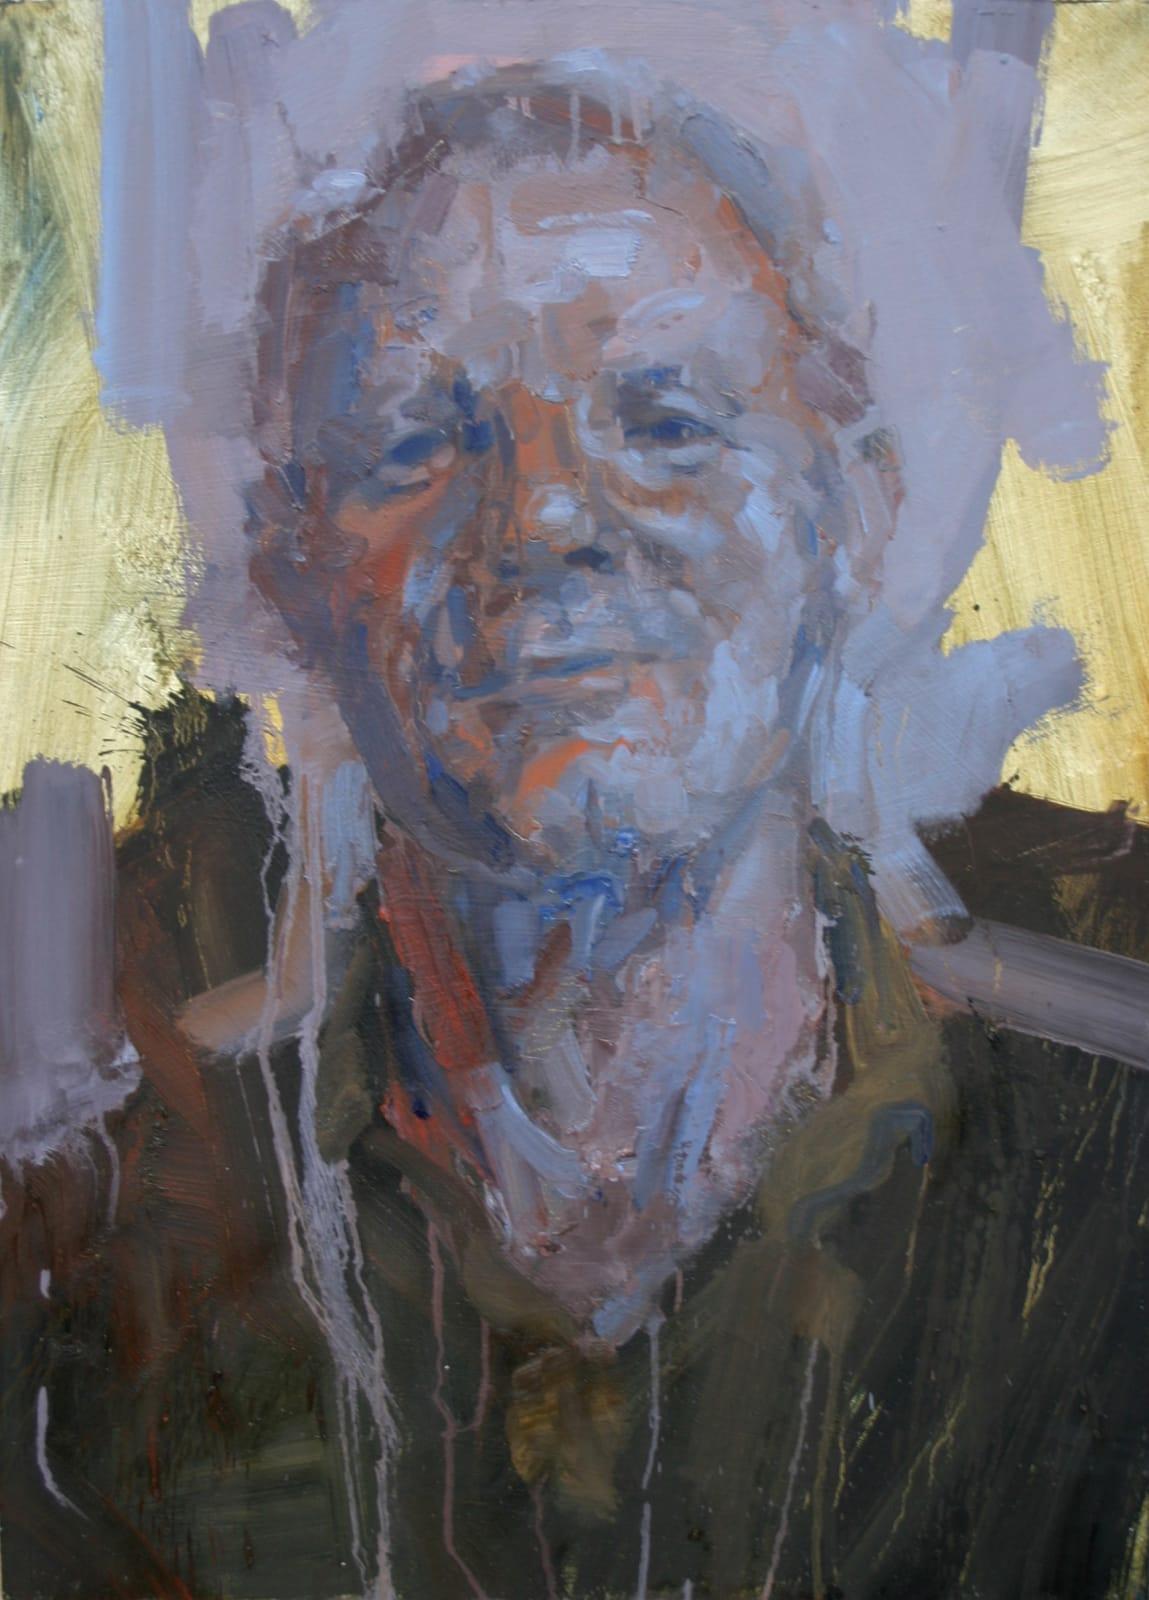 Cian McLoughlin Peter Doyle II Oil on board 73 x 53 cm